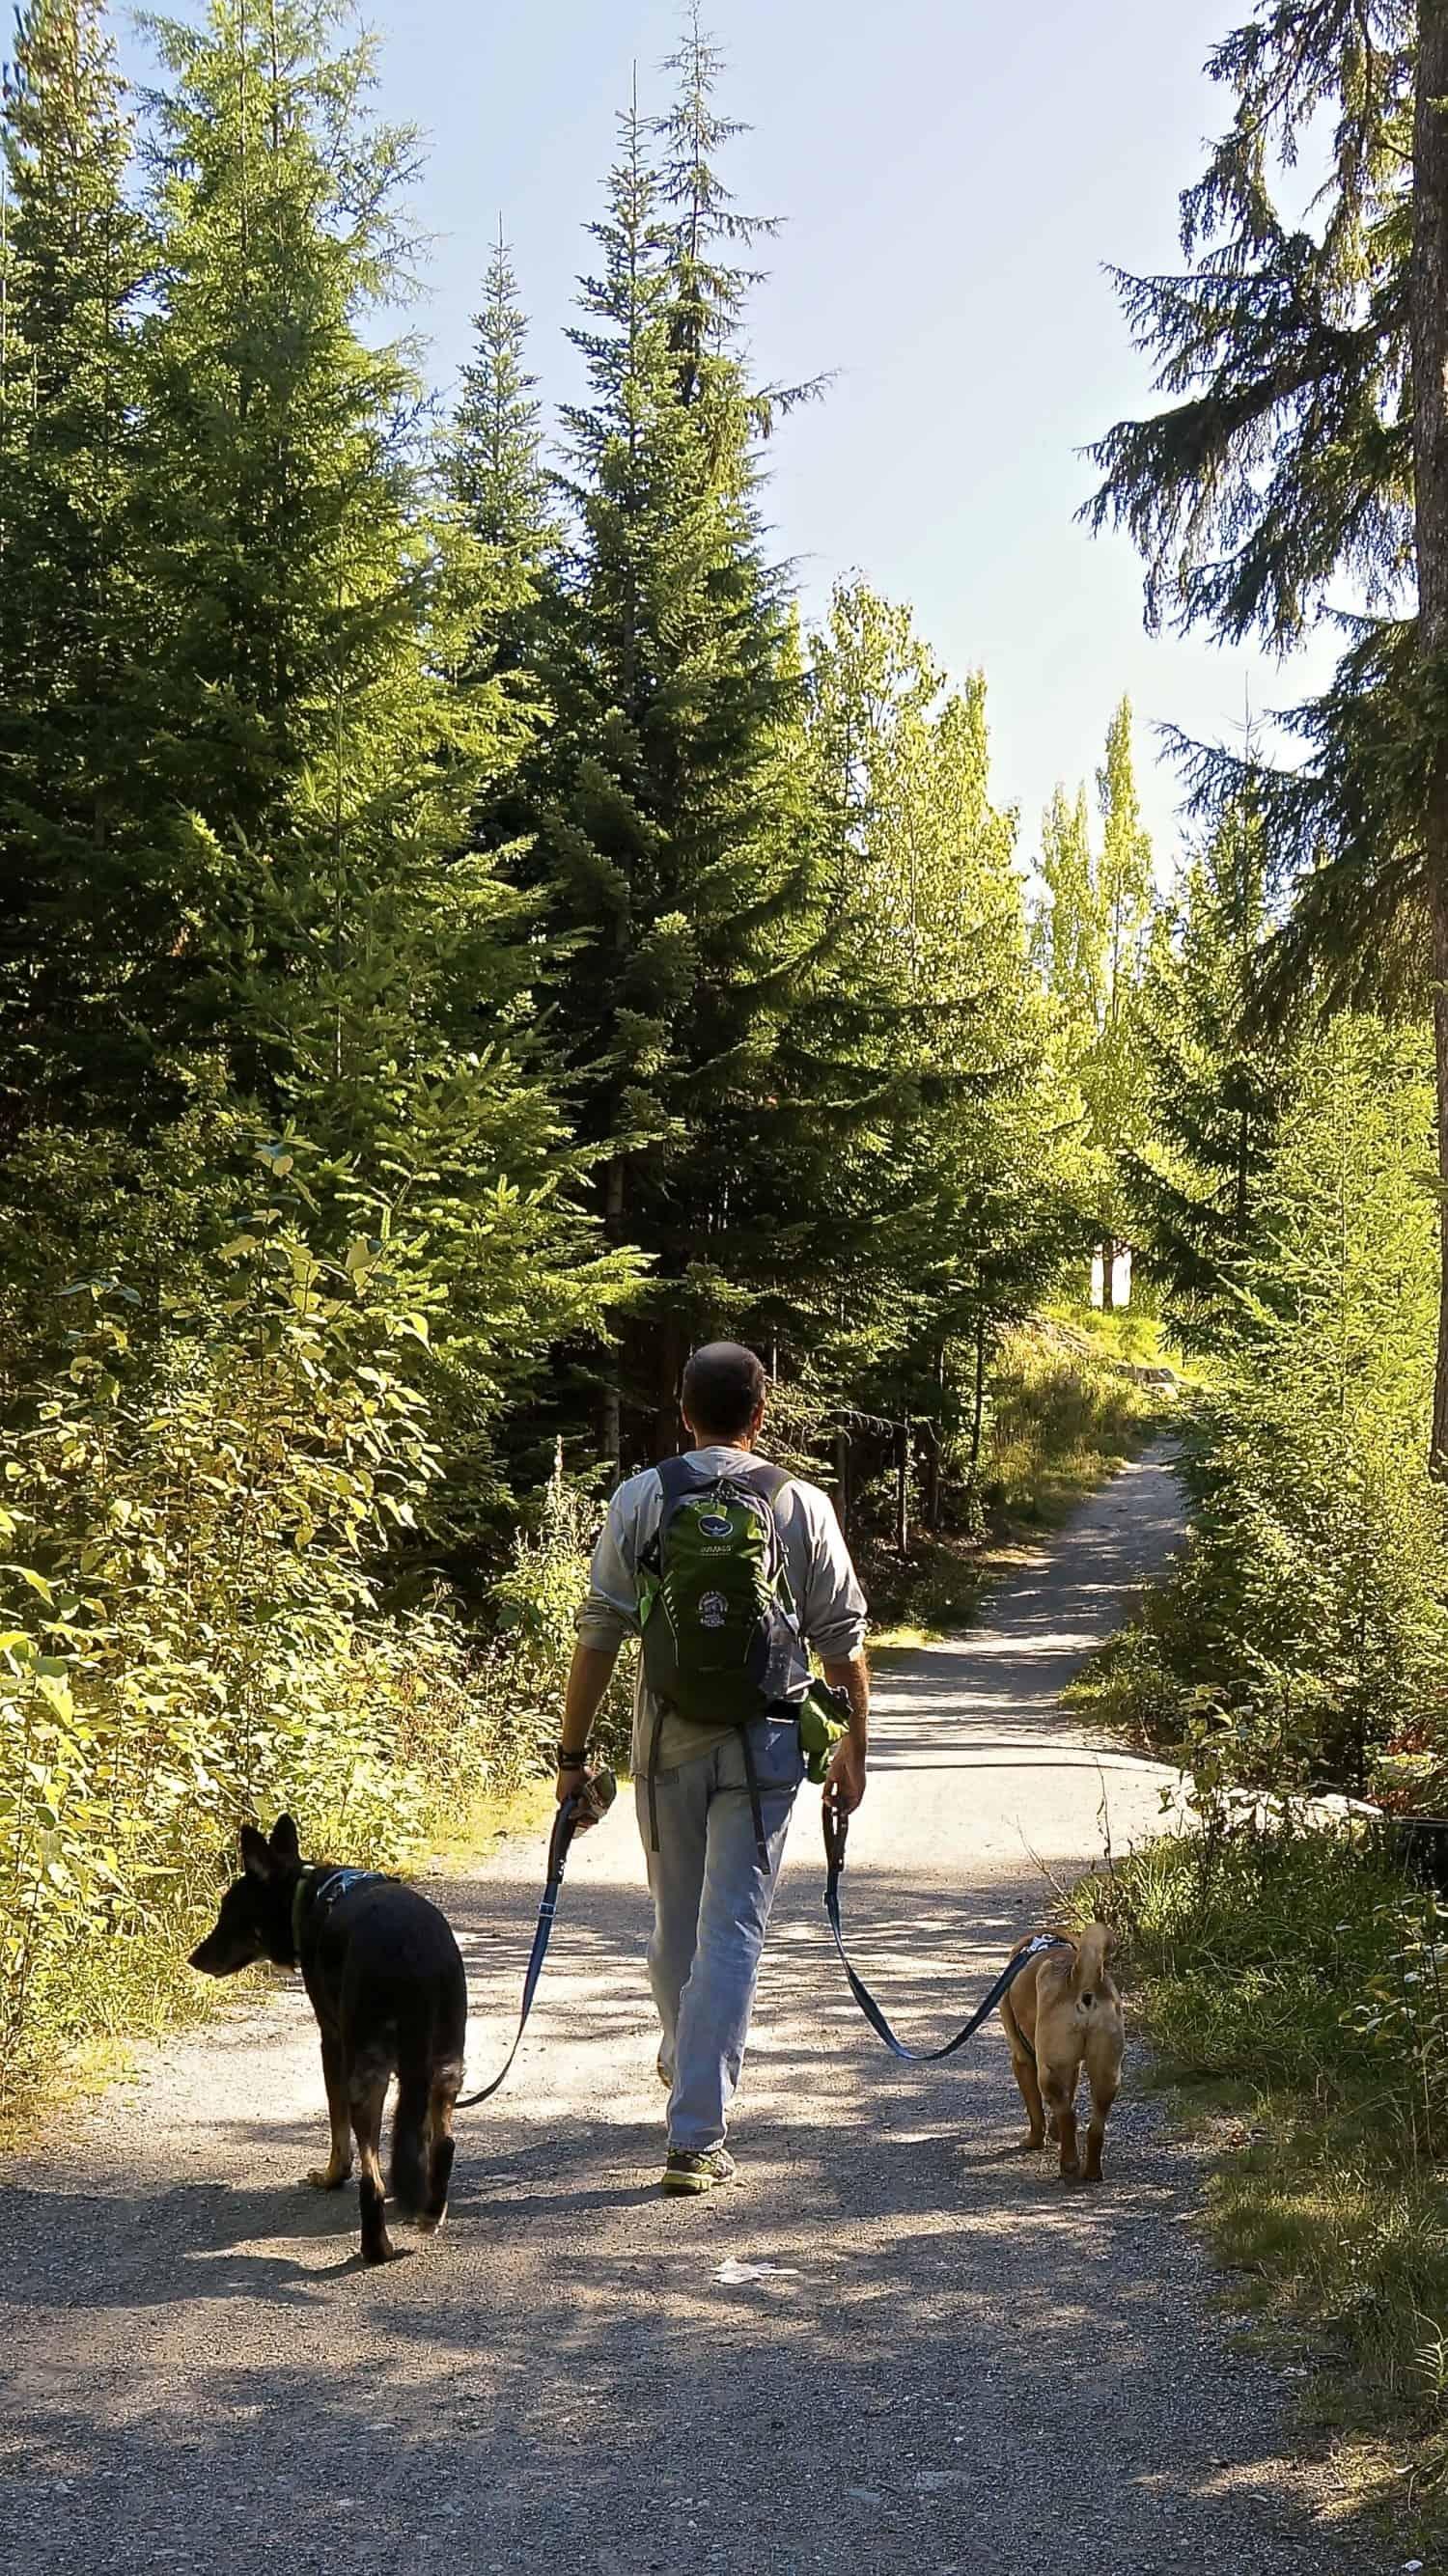 Dog Friendly Whistler, BC | GoPetFriendly.com